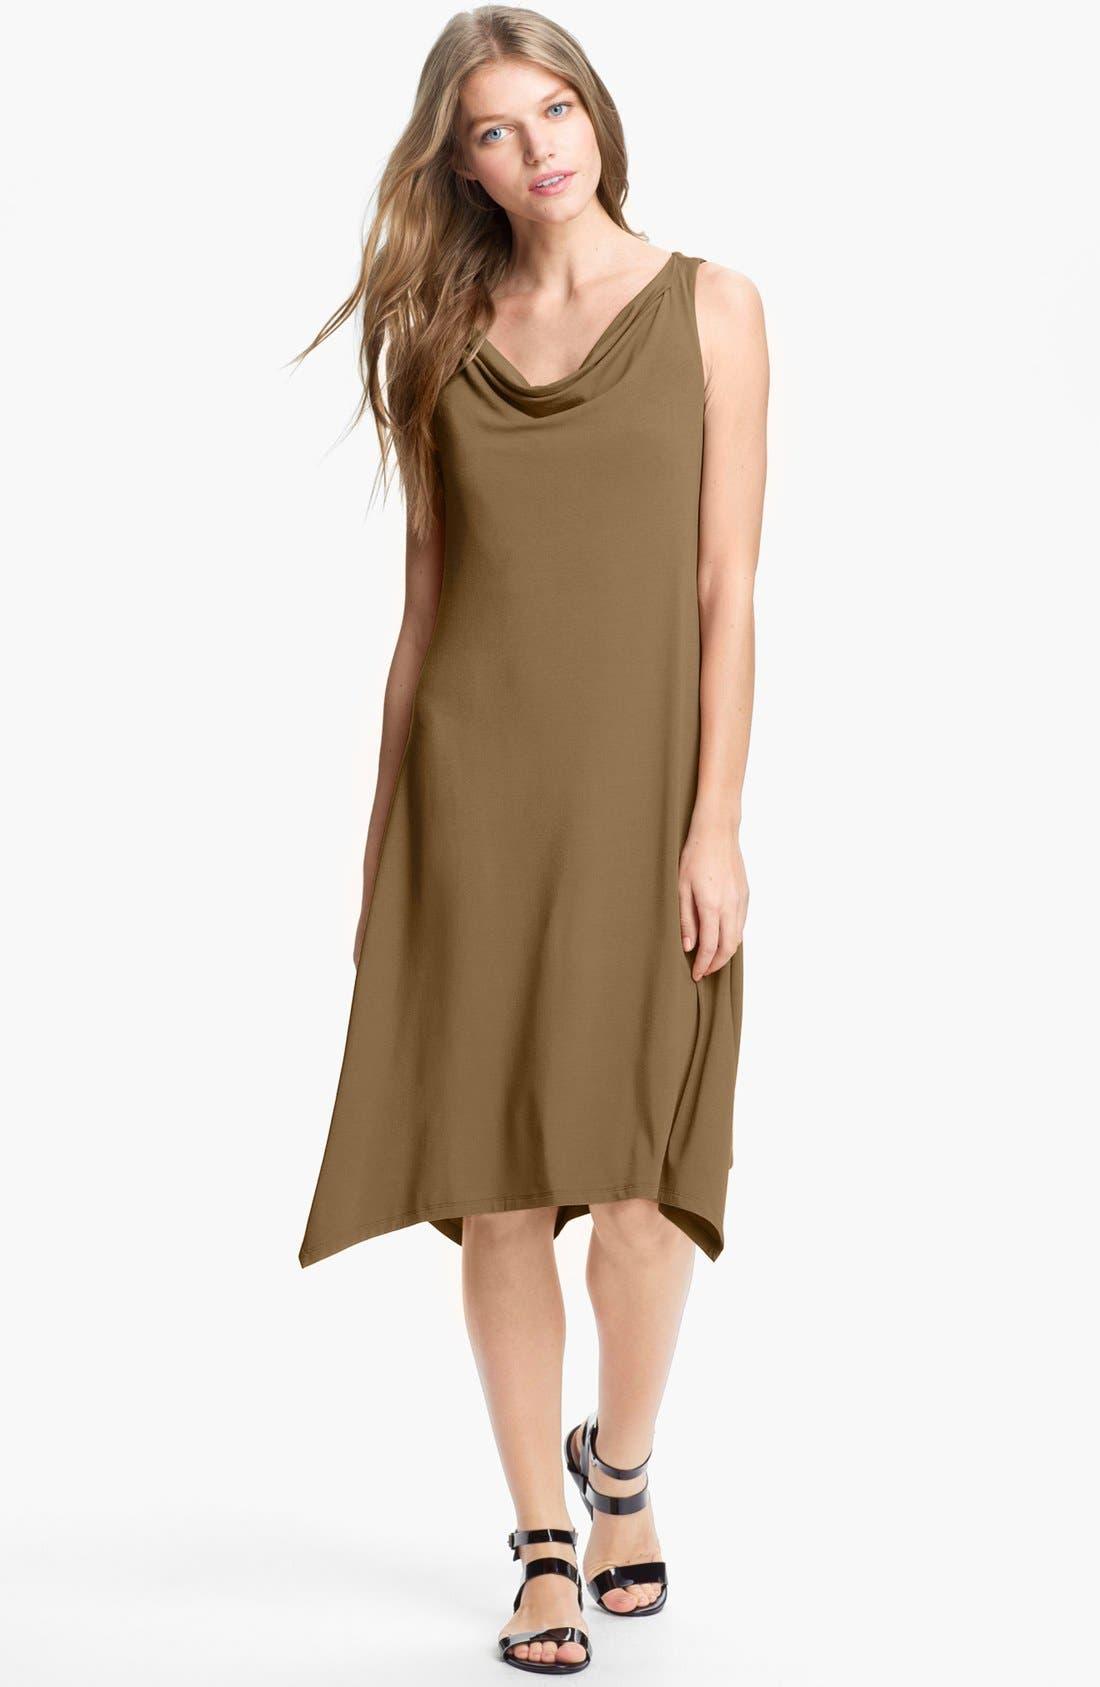 Alternate Image 1 Selected - Eileen Fisher Cowl Neck Dress (Regular & Petite)